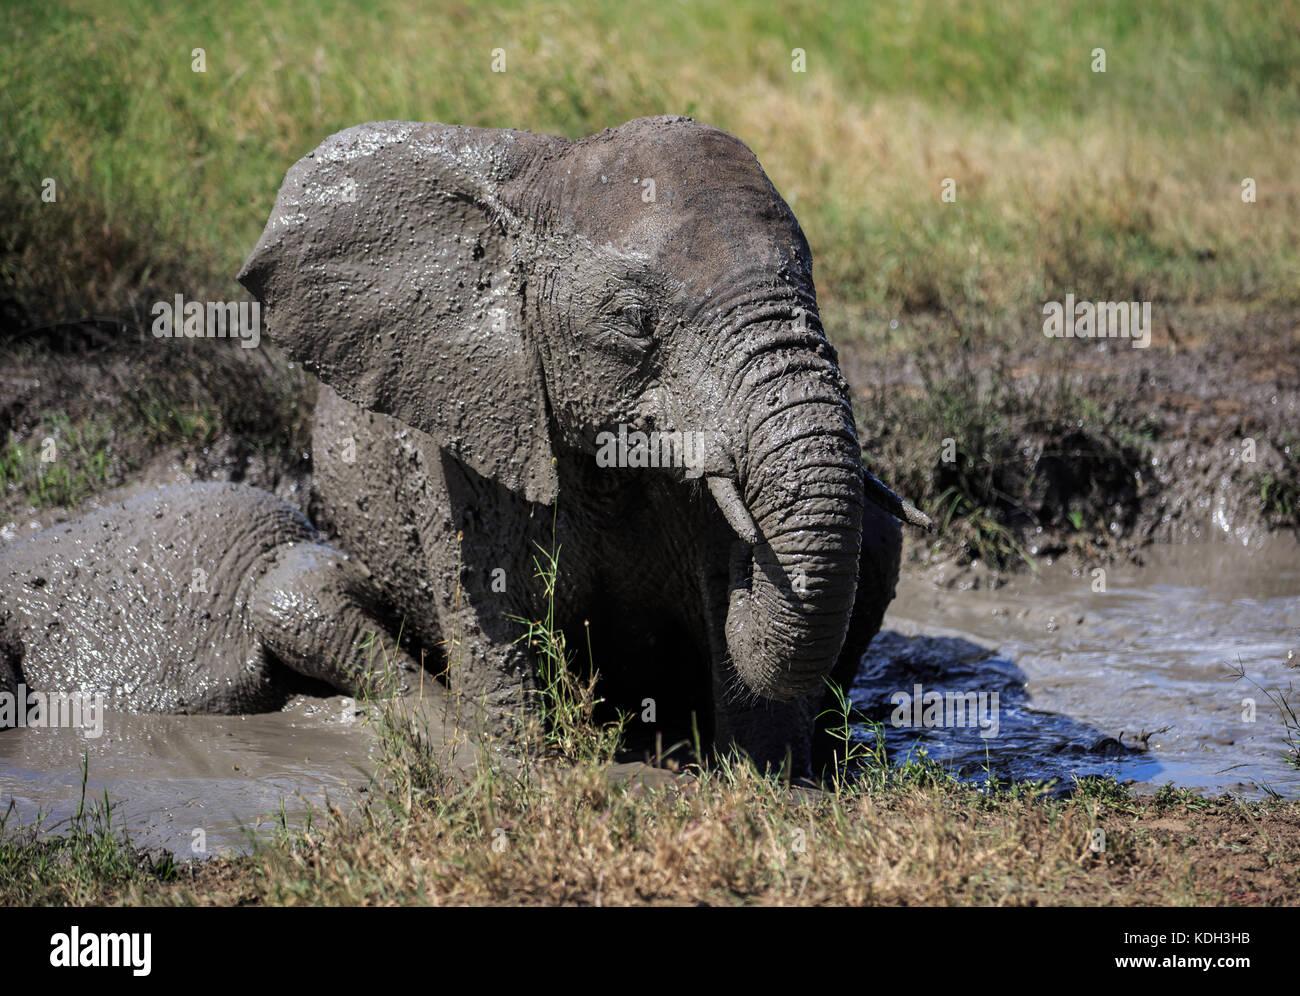 An African Elephant having a mud bath - Stock Image